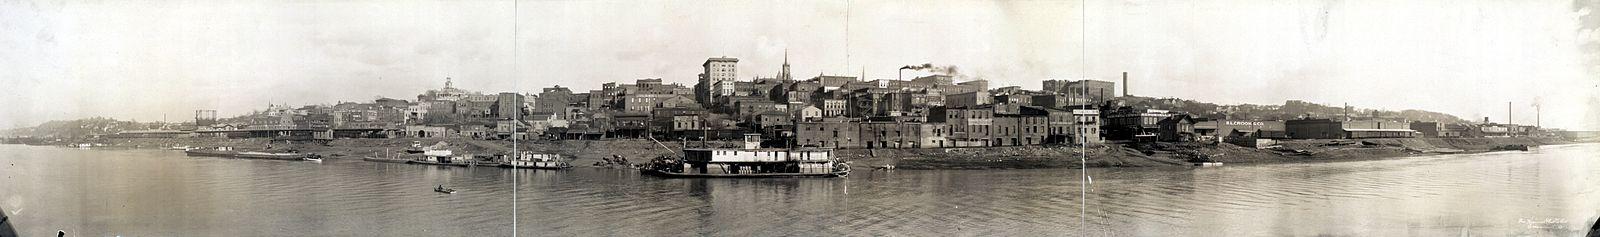 Vicksburg 1910 LOC pan 6a13672